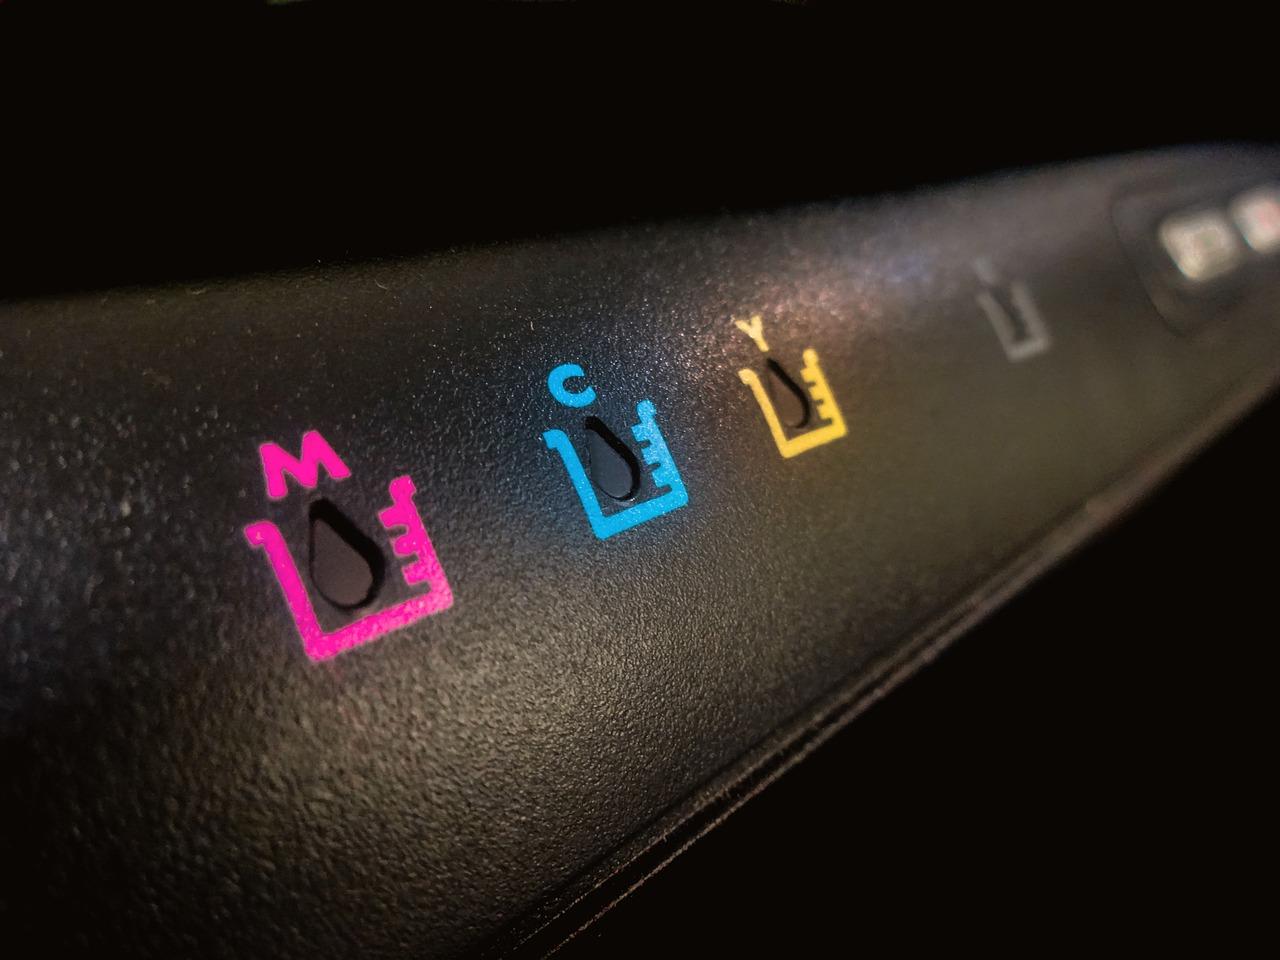 Jaka drukarka do kolorowych etykiet?